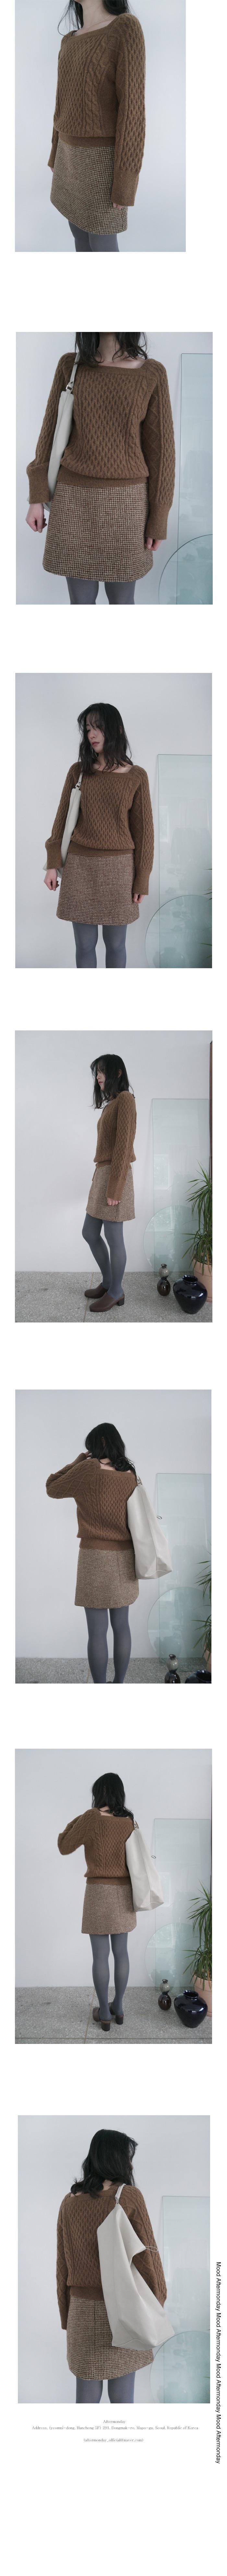 wool plaid set - skirt